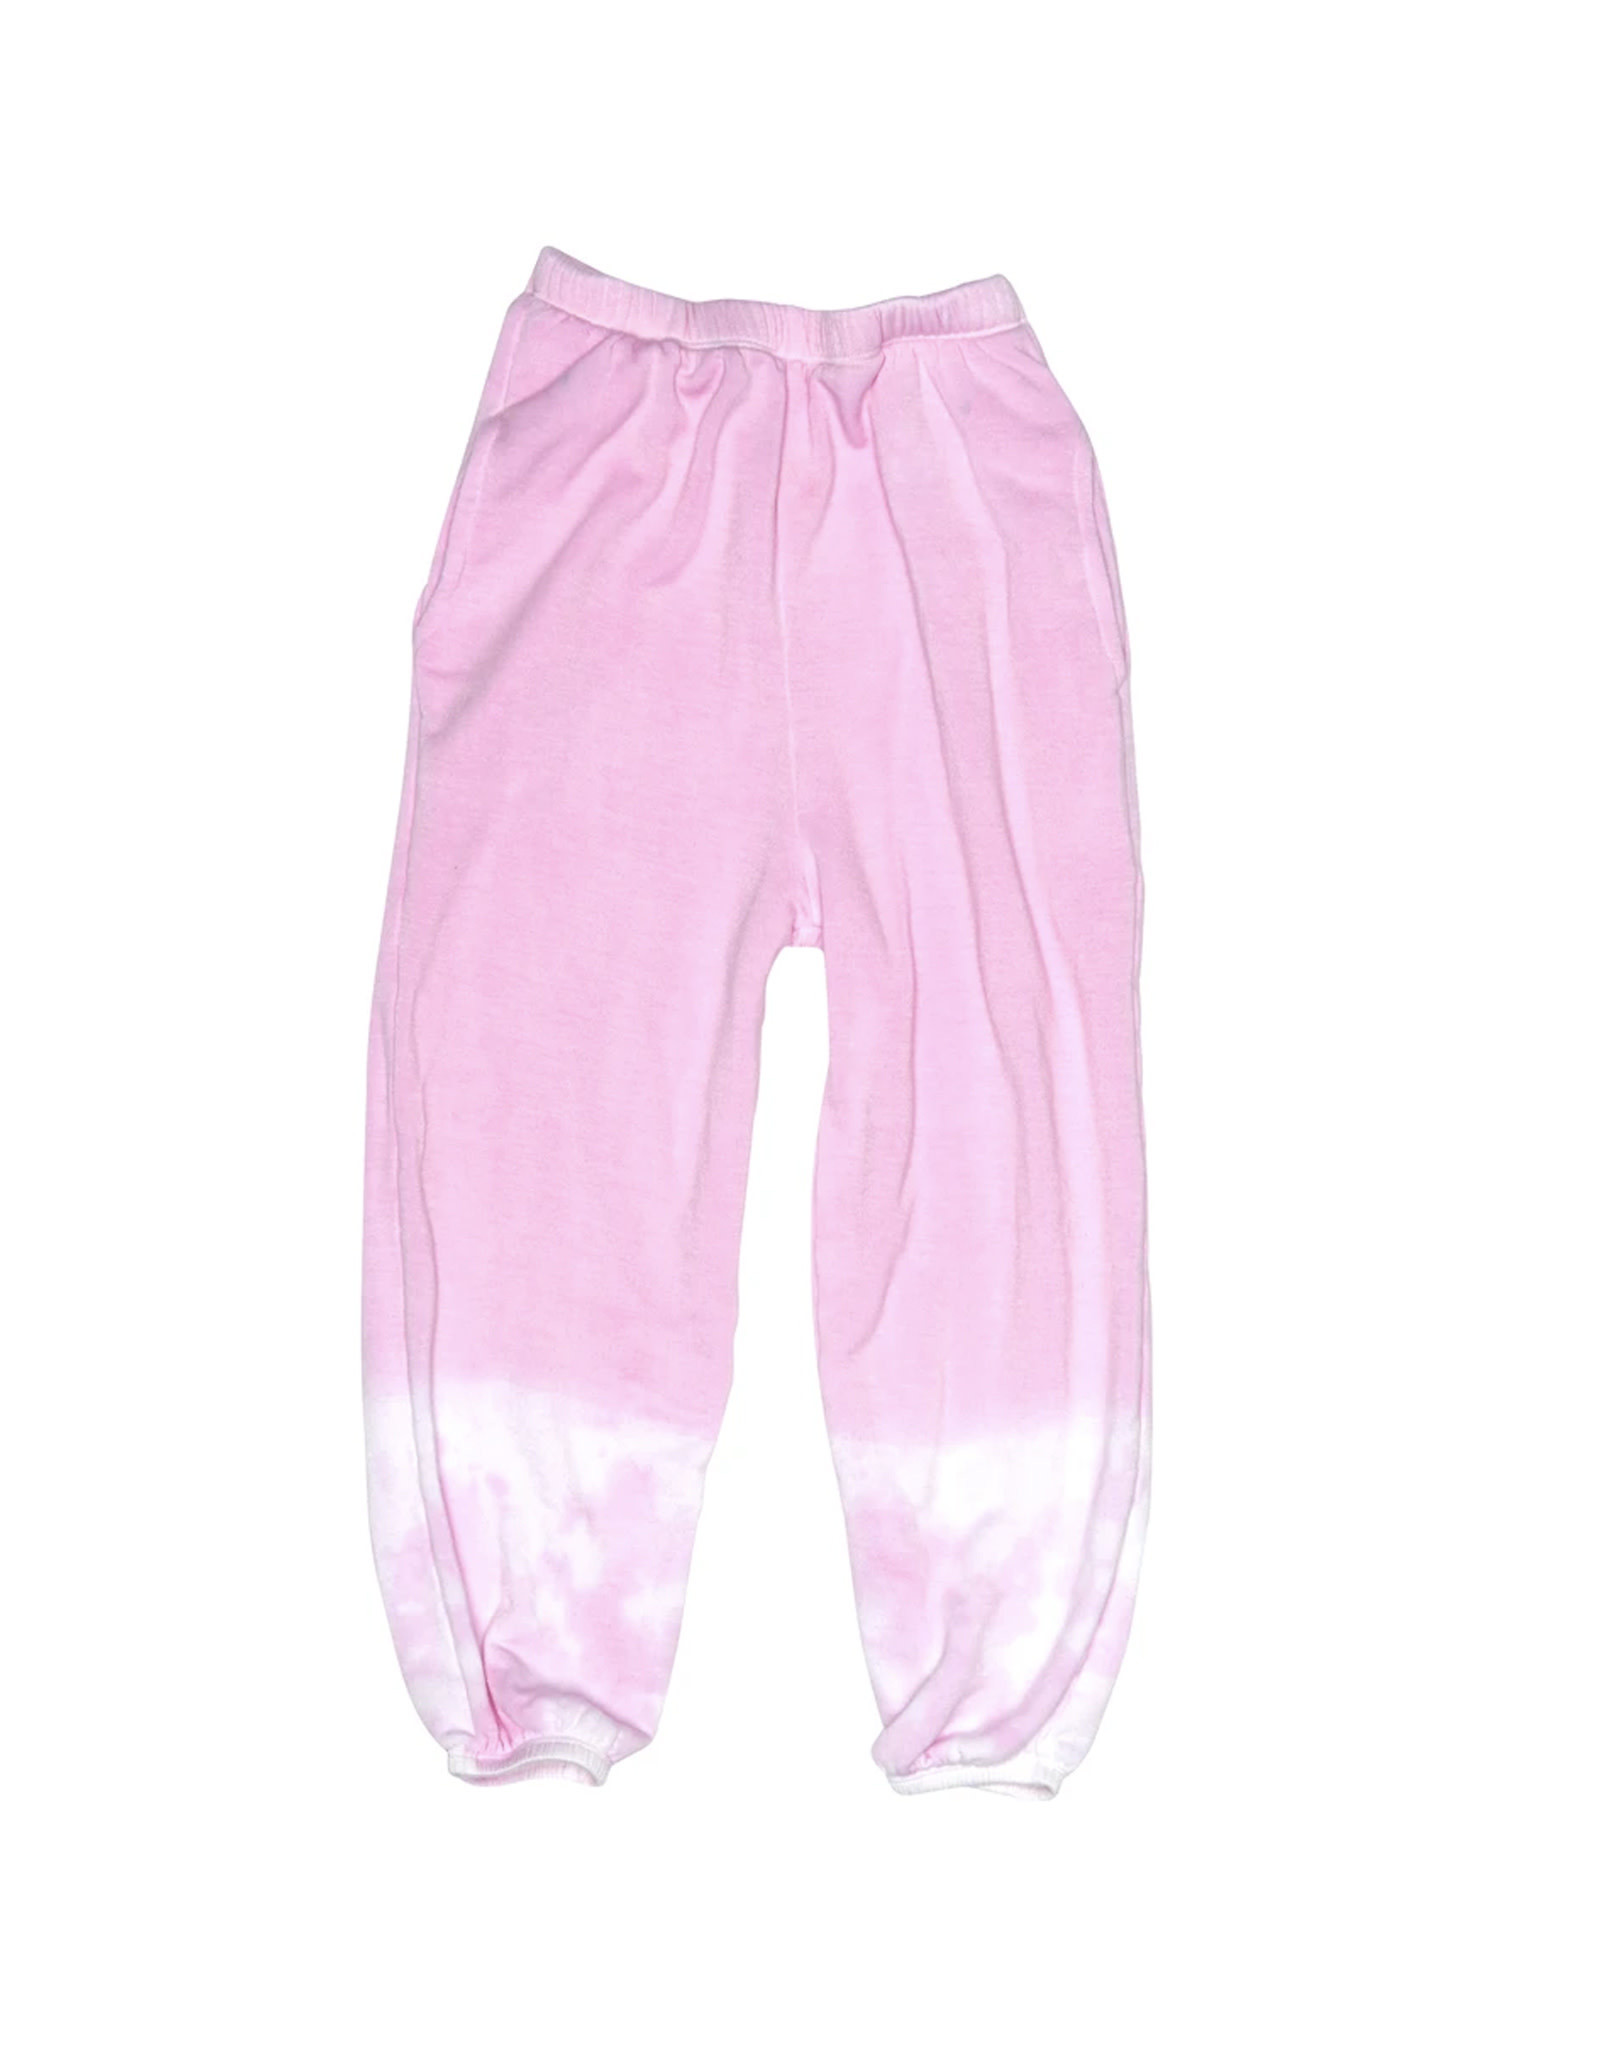 Fairwell Candy Gym Sweats